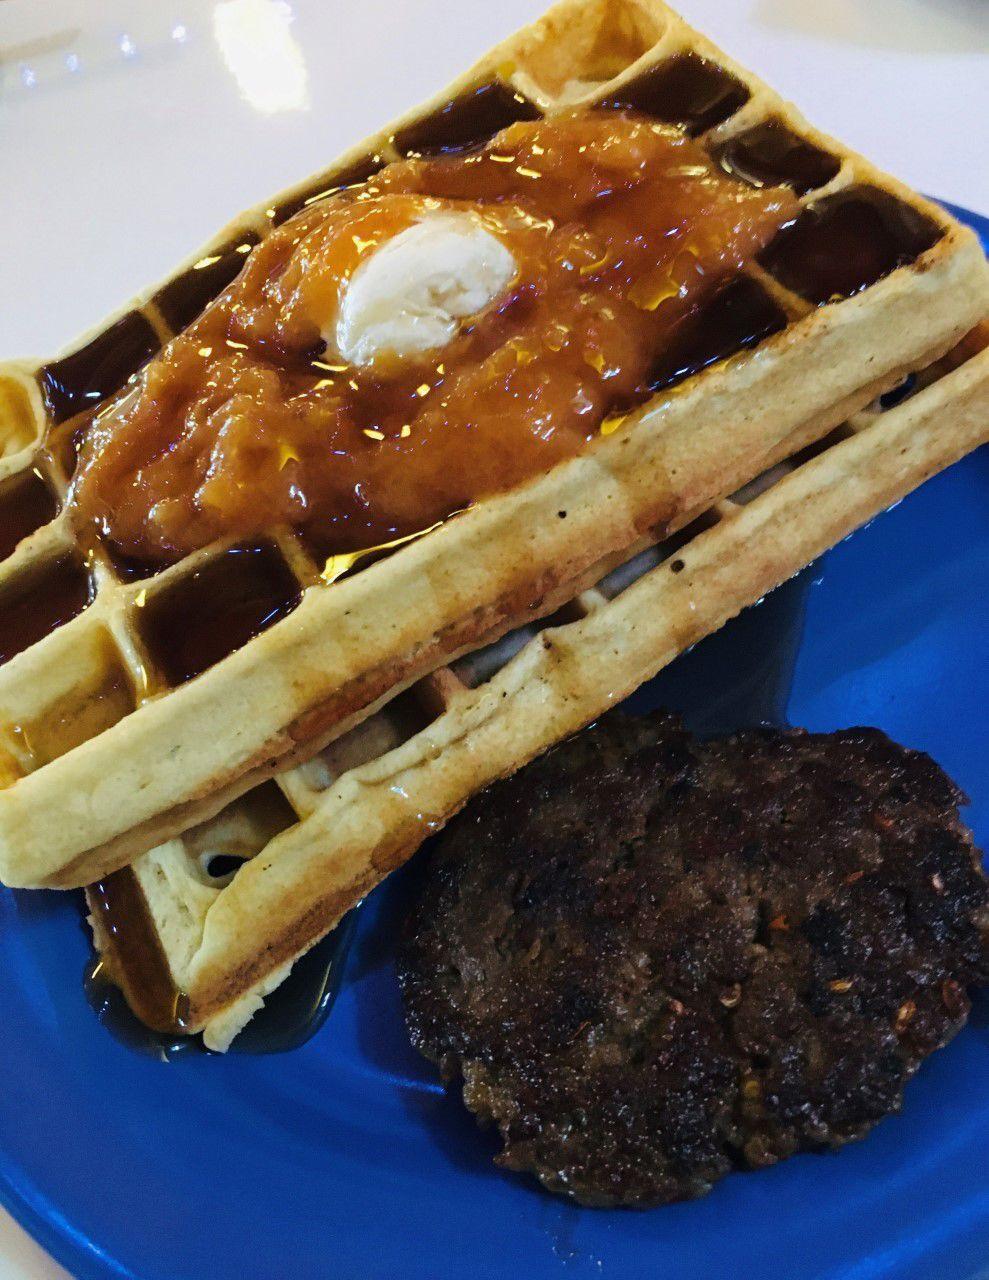 20210127-gm-foodguy_Belgian Waffle with Peach Jam Cafe Appalachia.jpg